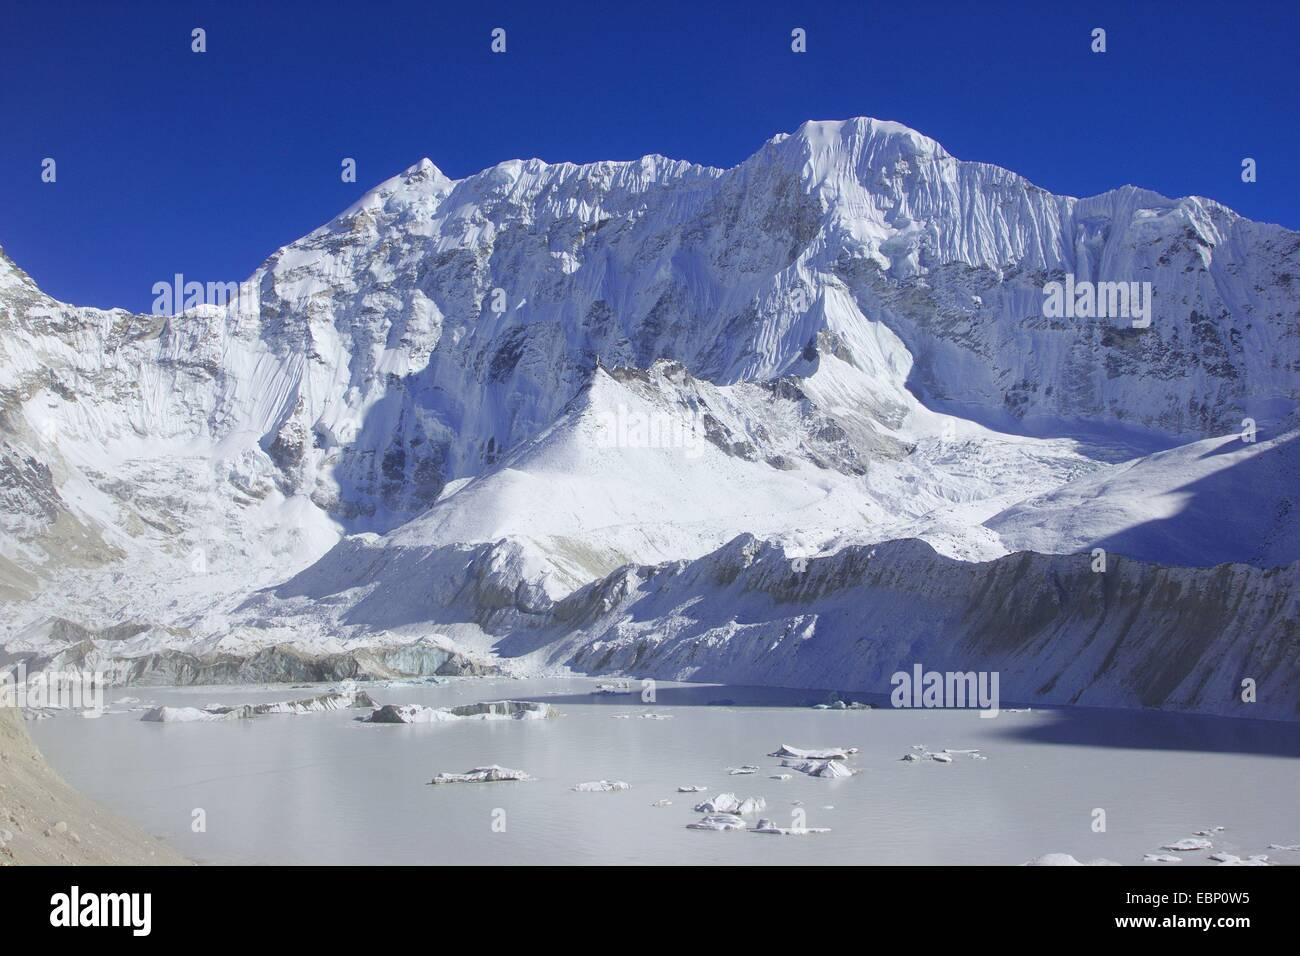 lake Imja Tsho near Island Peak Base Camo and Baruntse, Nepal, Himalaya, Khumbu Himal - Stock Image